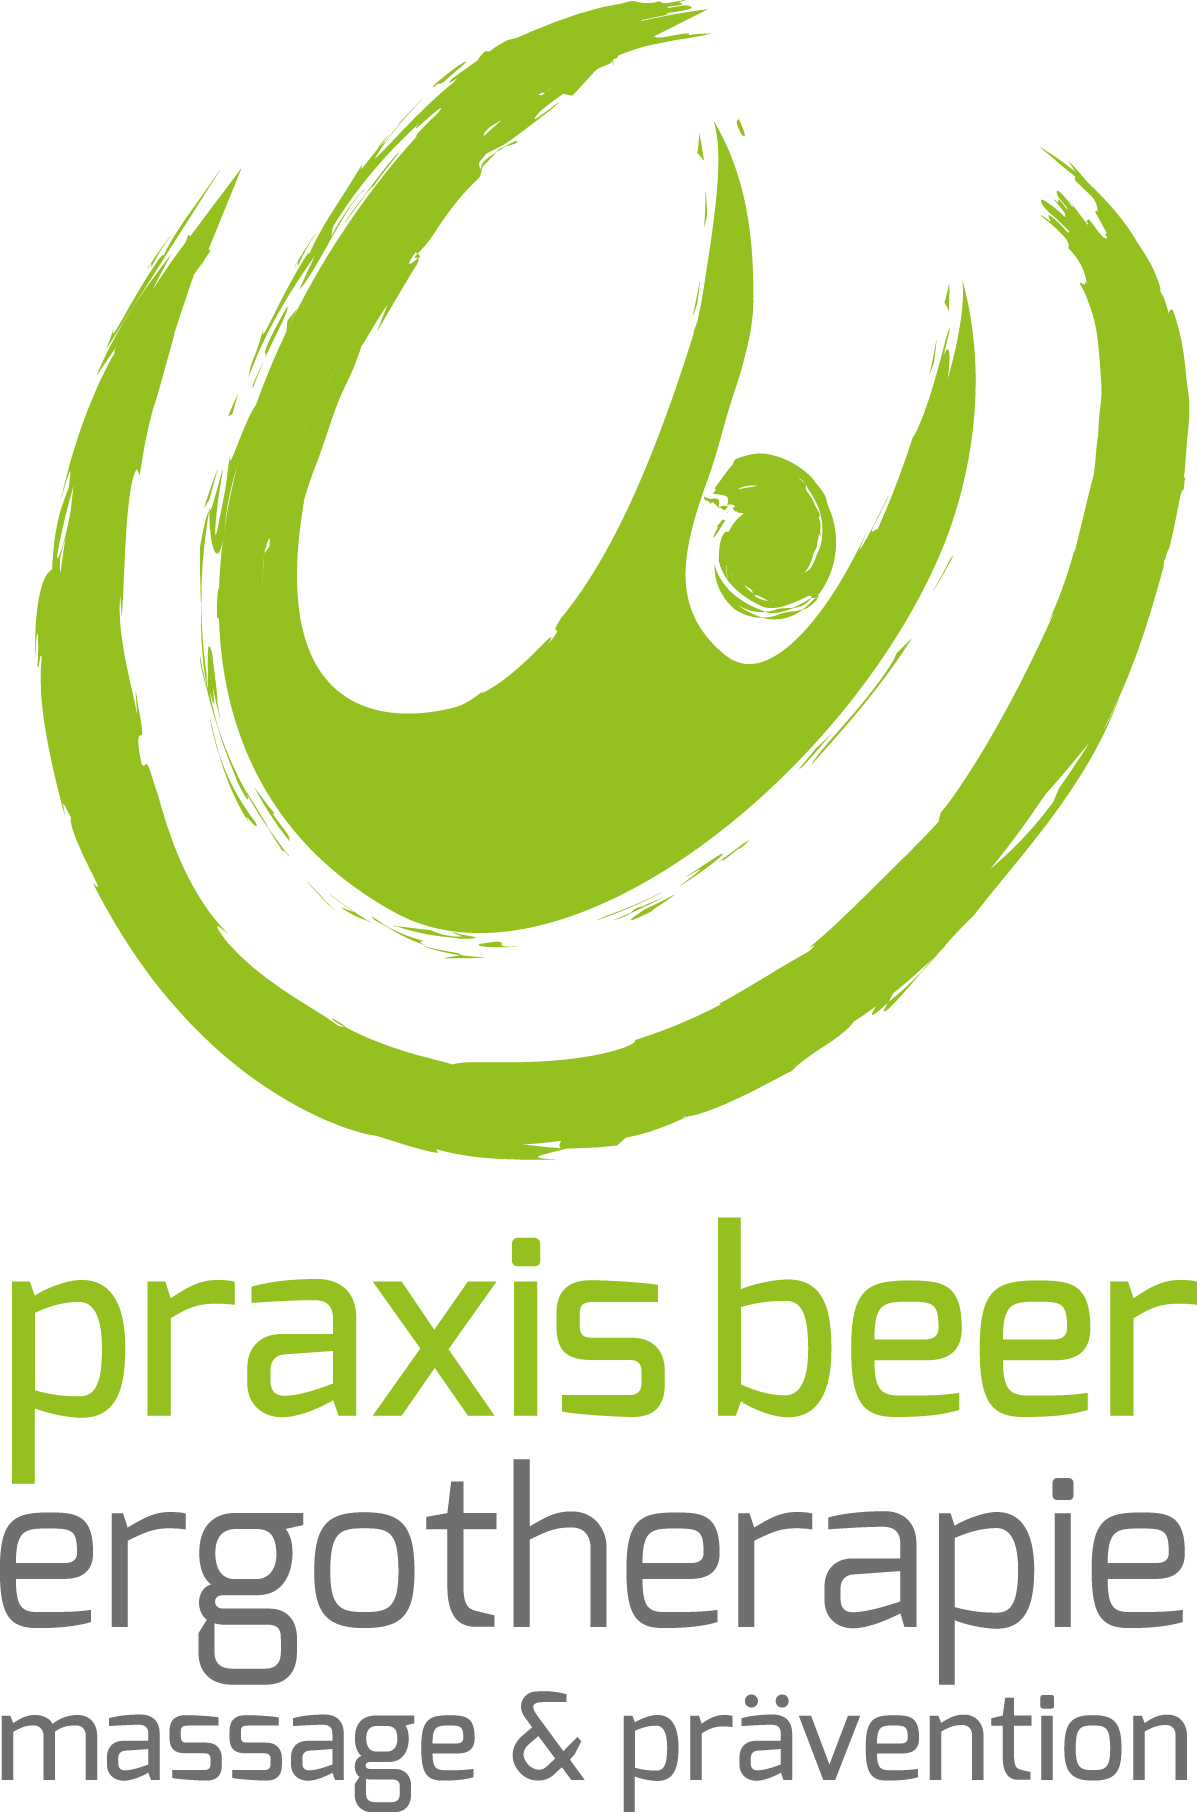 Praxis Beer - Ergotherapie, Massage & Prävention